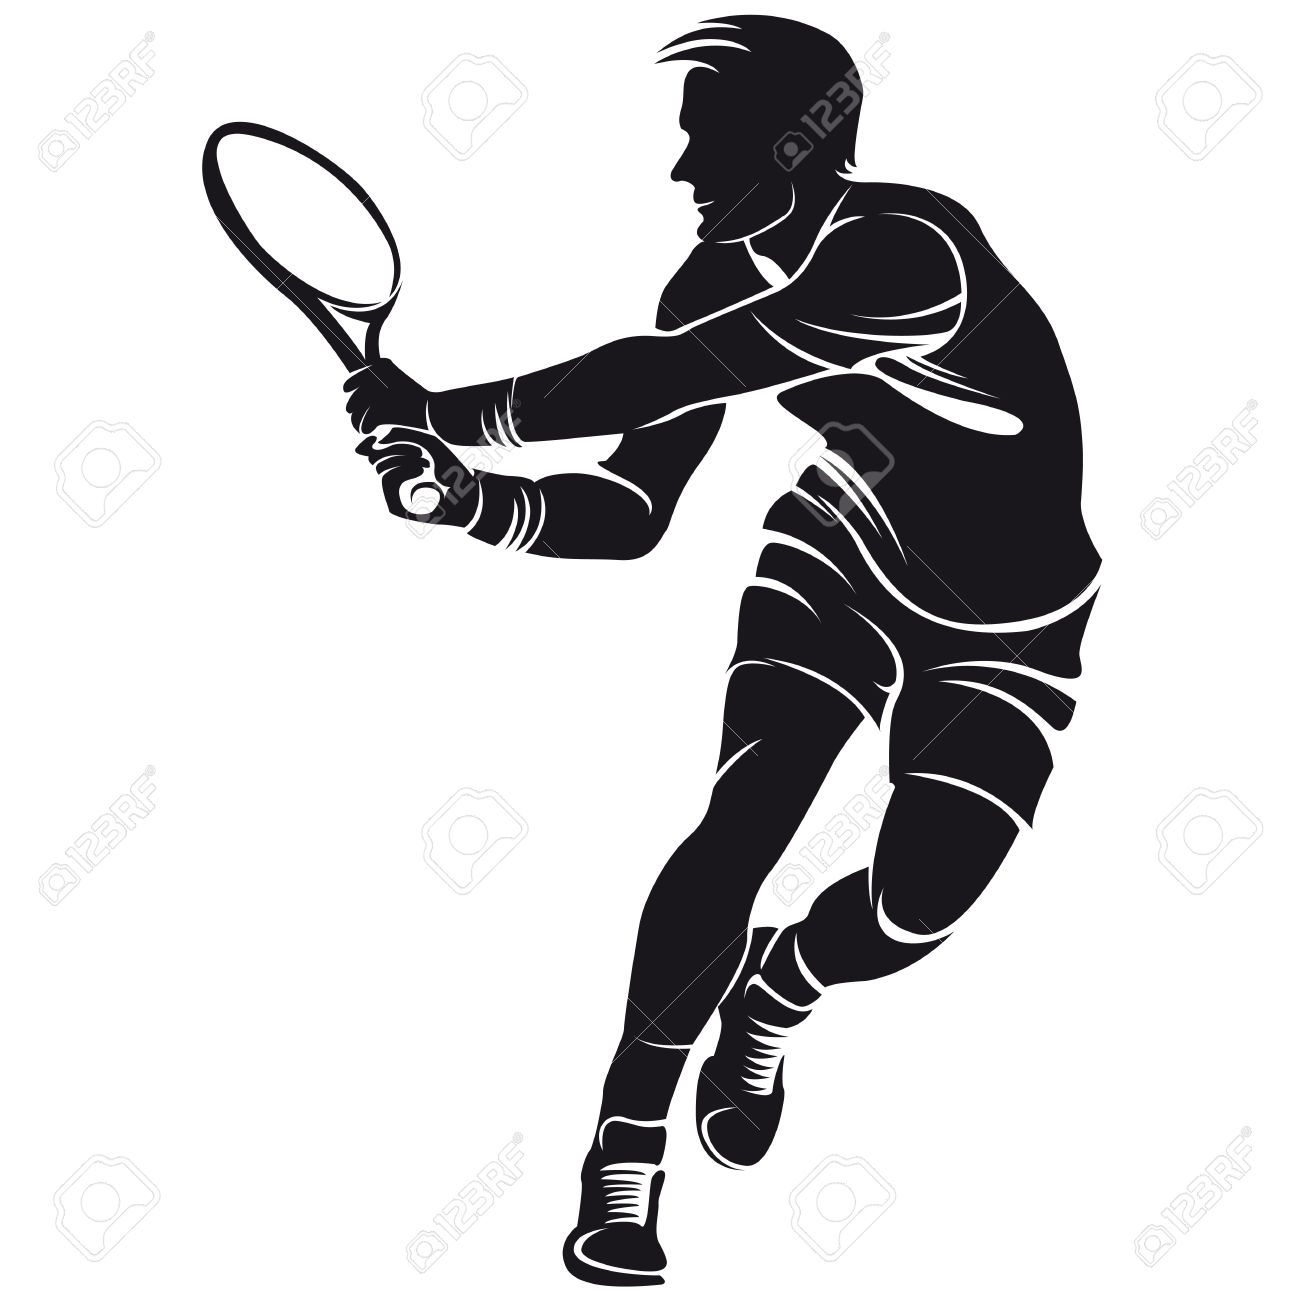 Silhouette Tennis Google Search Tatuirovki S Volkom Detskij Sad